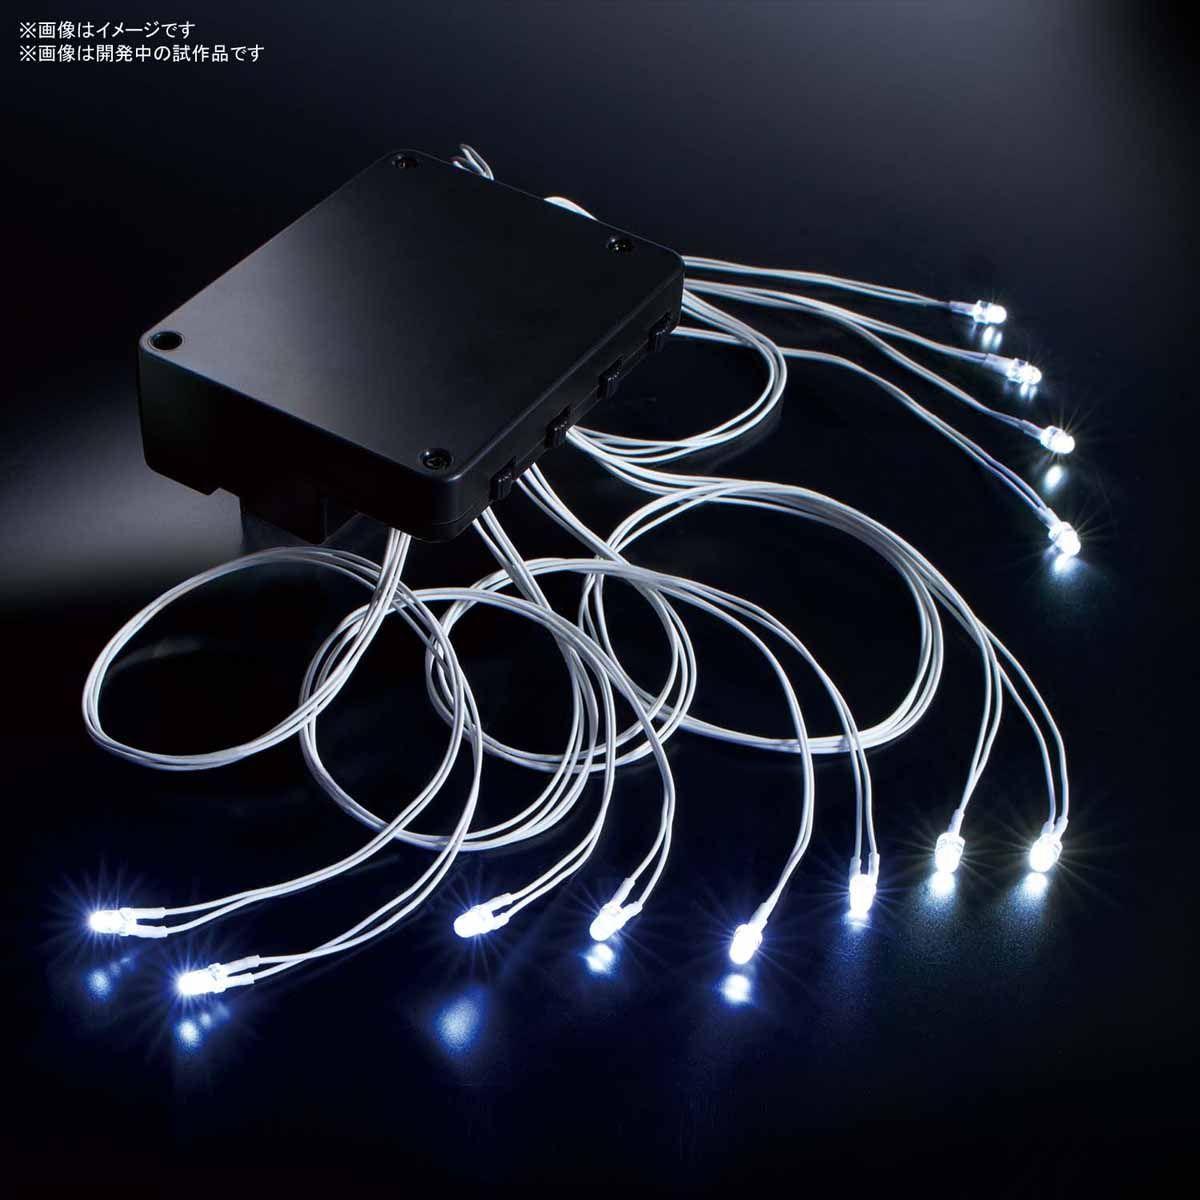 LED組件(白)12盞式